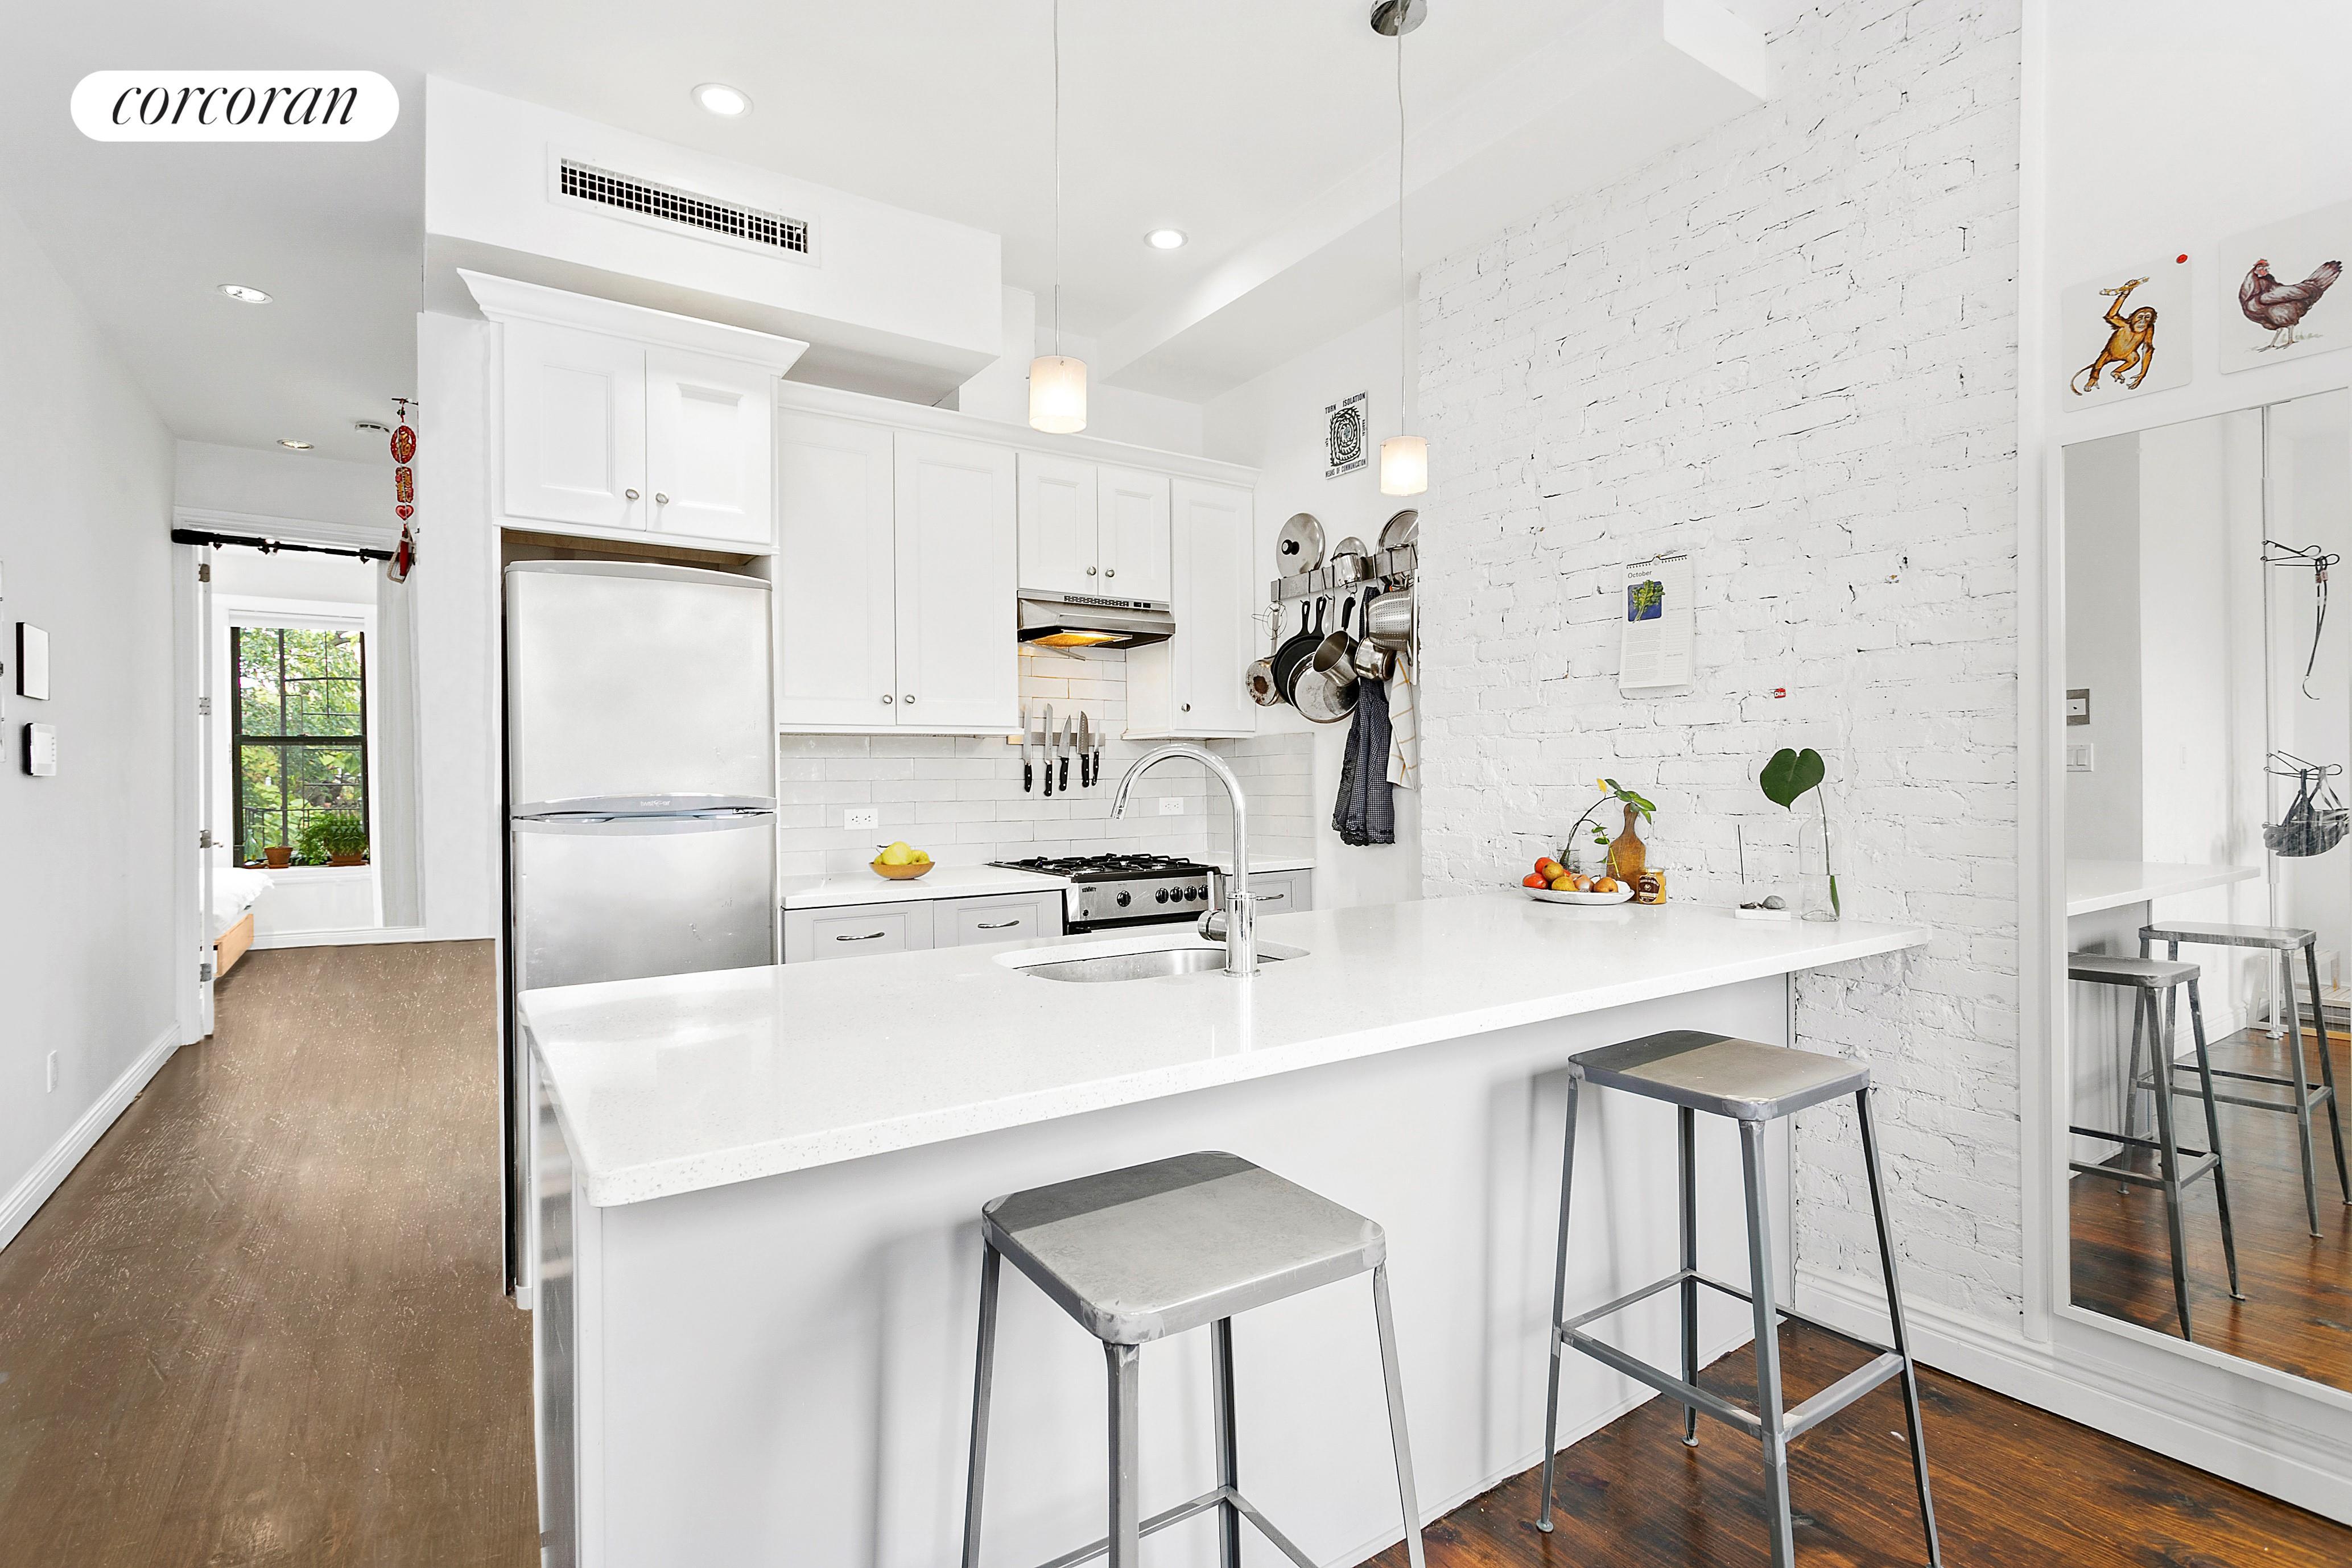 839 Greene Avenue Bedford Stuyvesant Brooklyn NY 11221